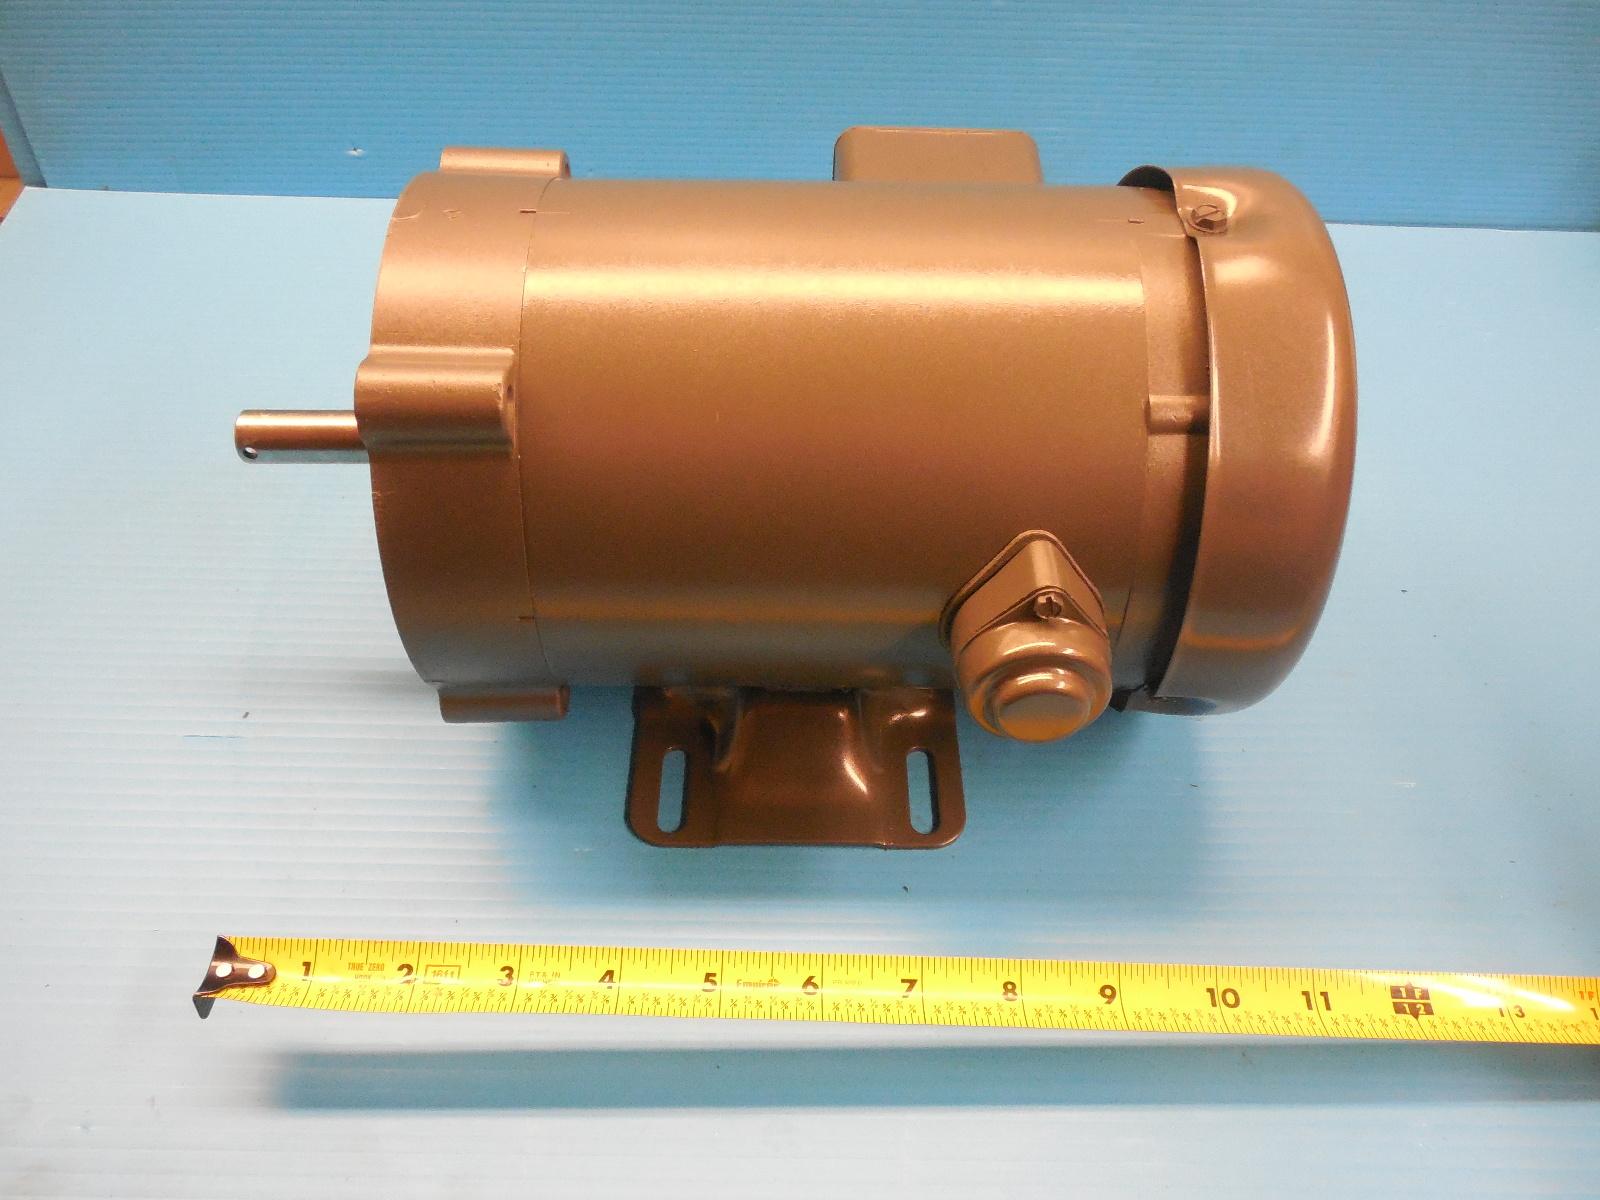 New Baldor Industrial Dc Motor 34 4013 5249g1 1725 R P M 575 Volts 0 5 Hp Ebay